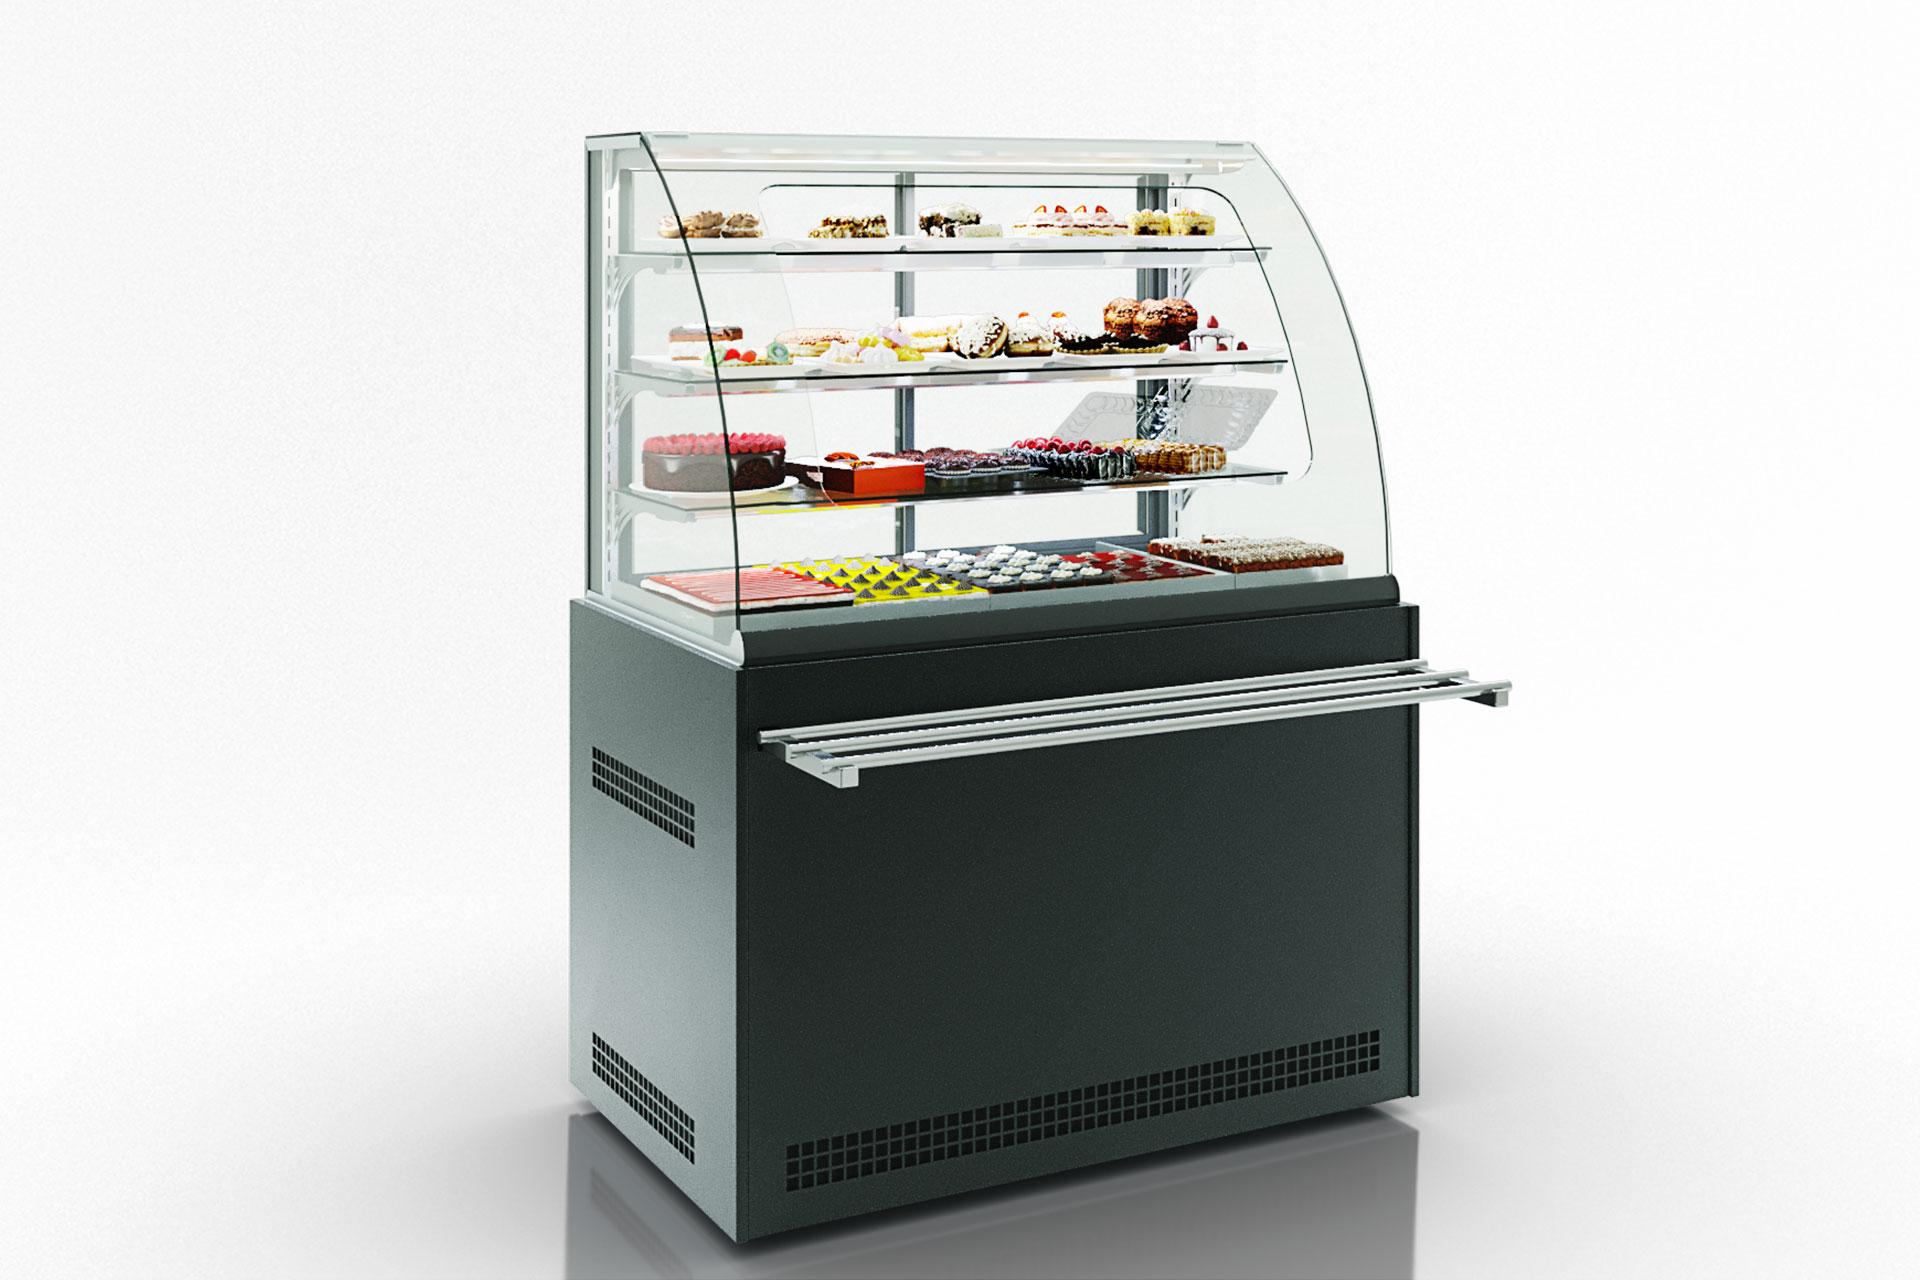 Confectionery counters Dakota GA 085 patisserie self SL 180-DLA